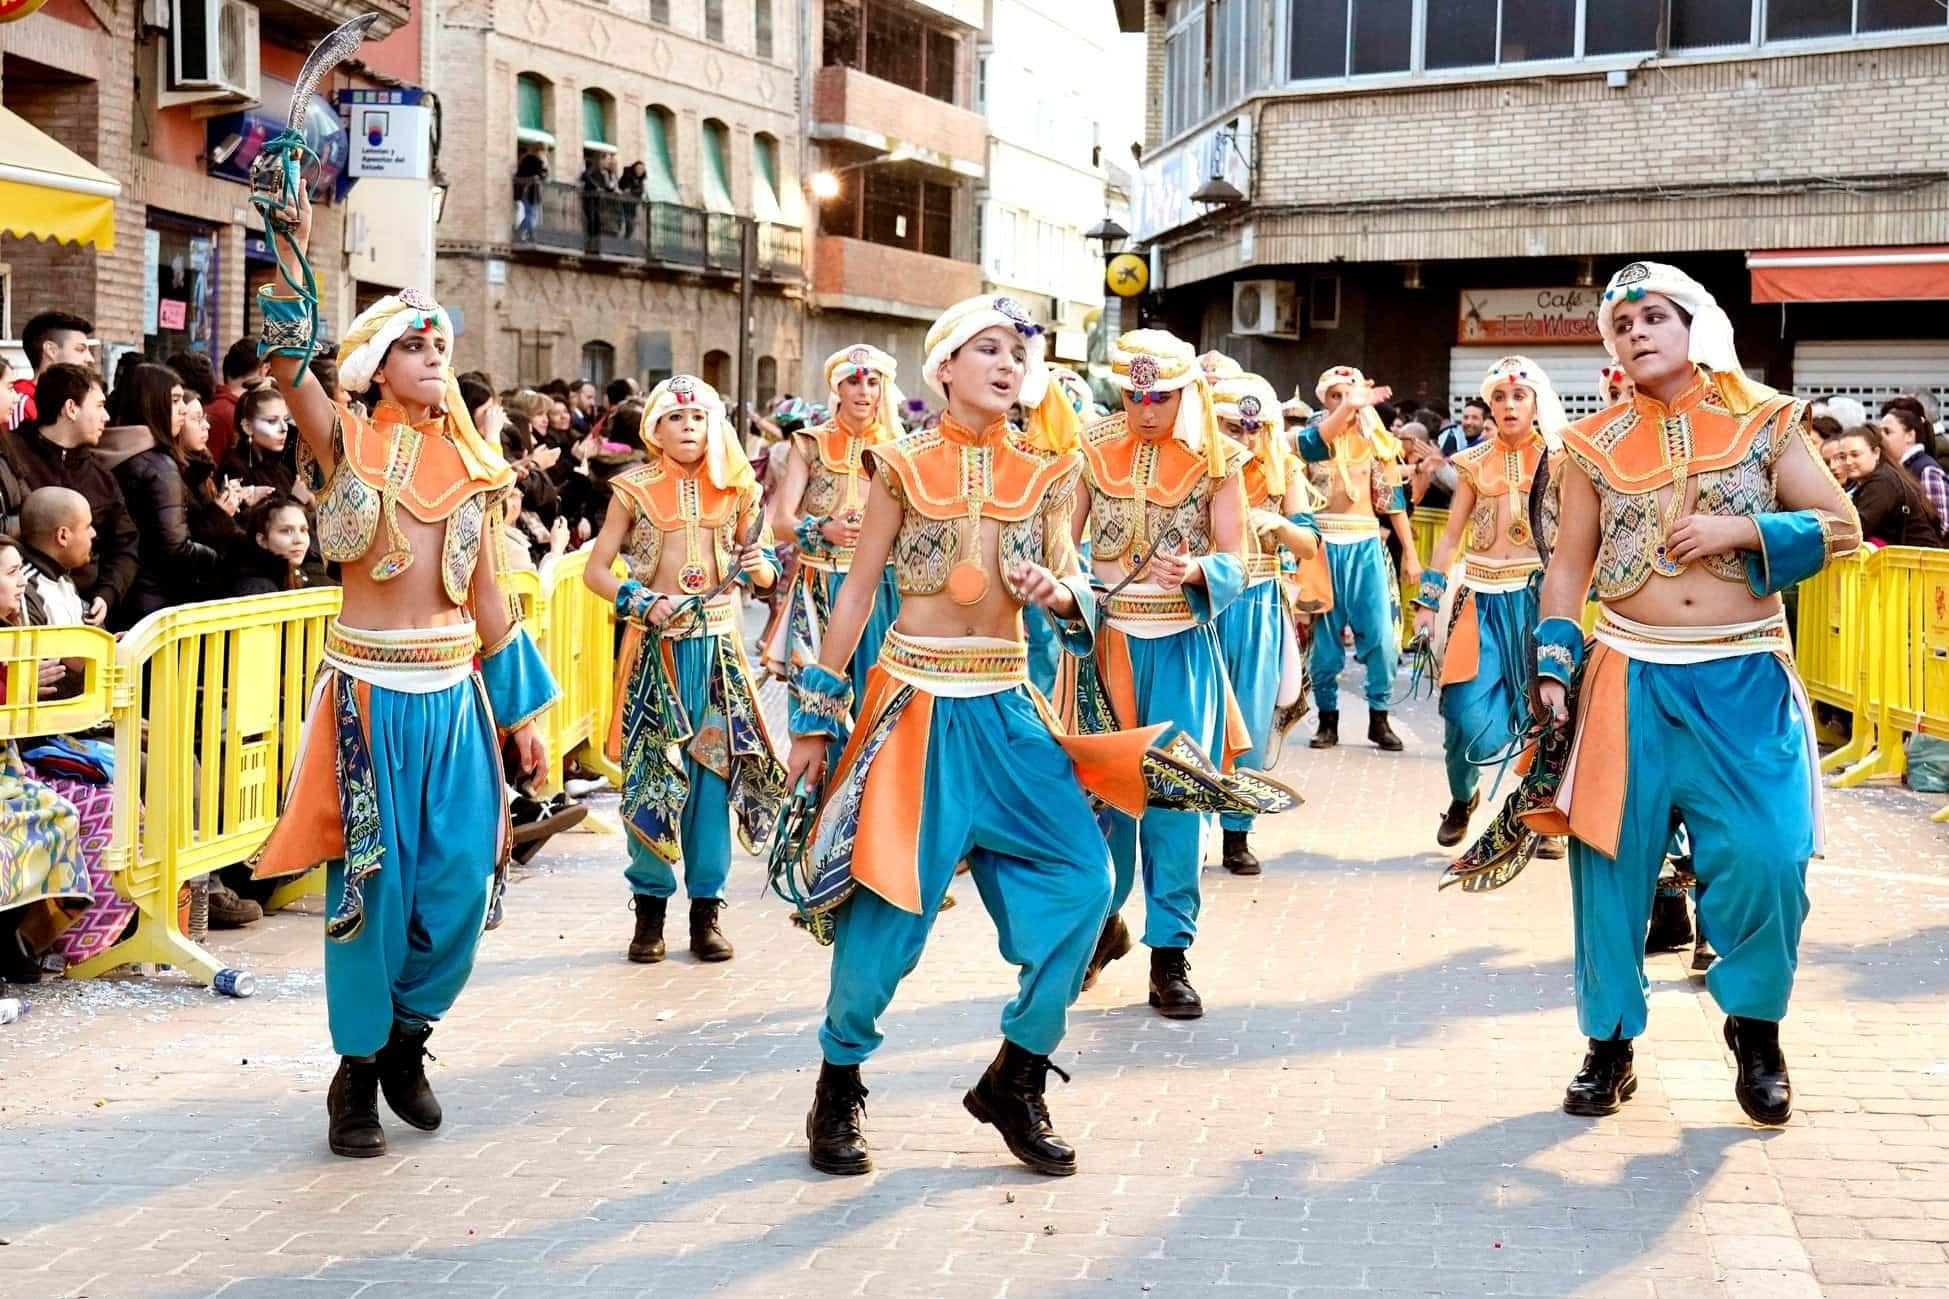 Carnaval de herencia 2020 ofertorio 156 - Selección de fotografías del Ofertorio del Carnaval de Herencia